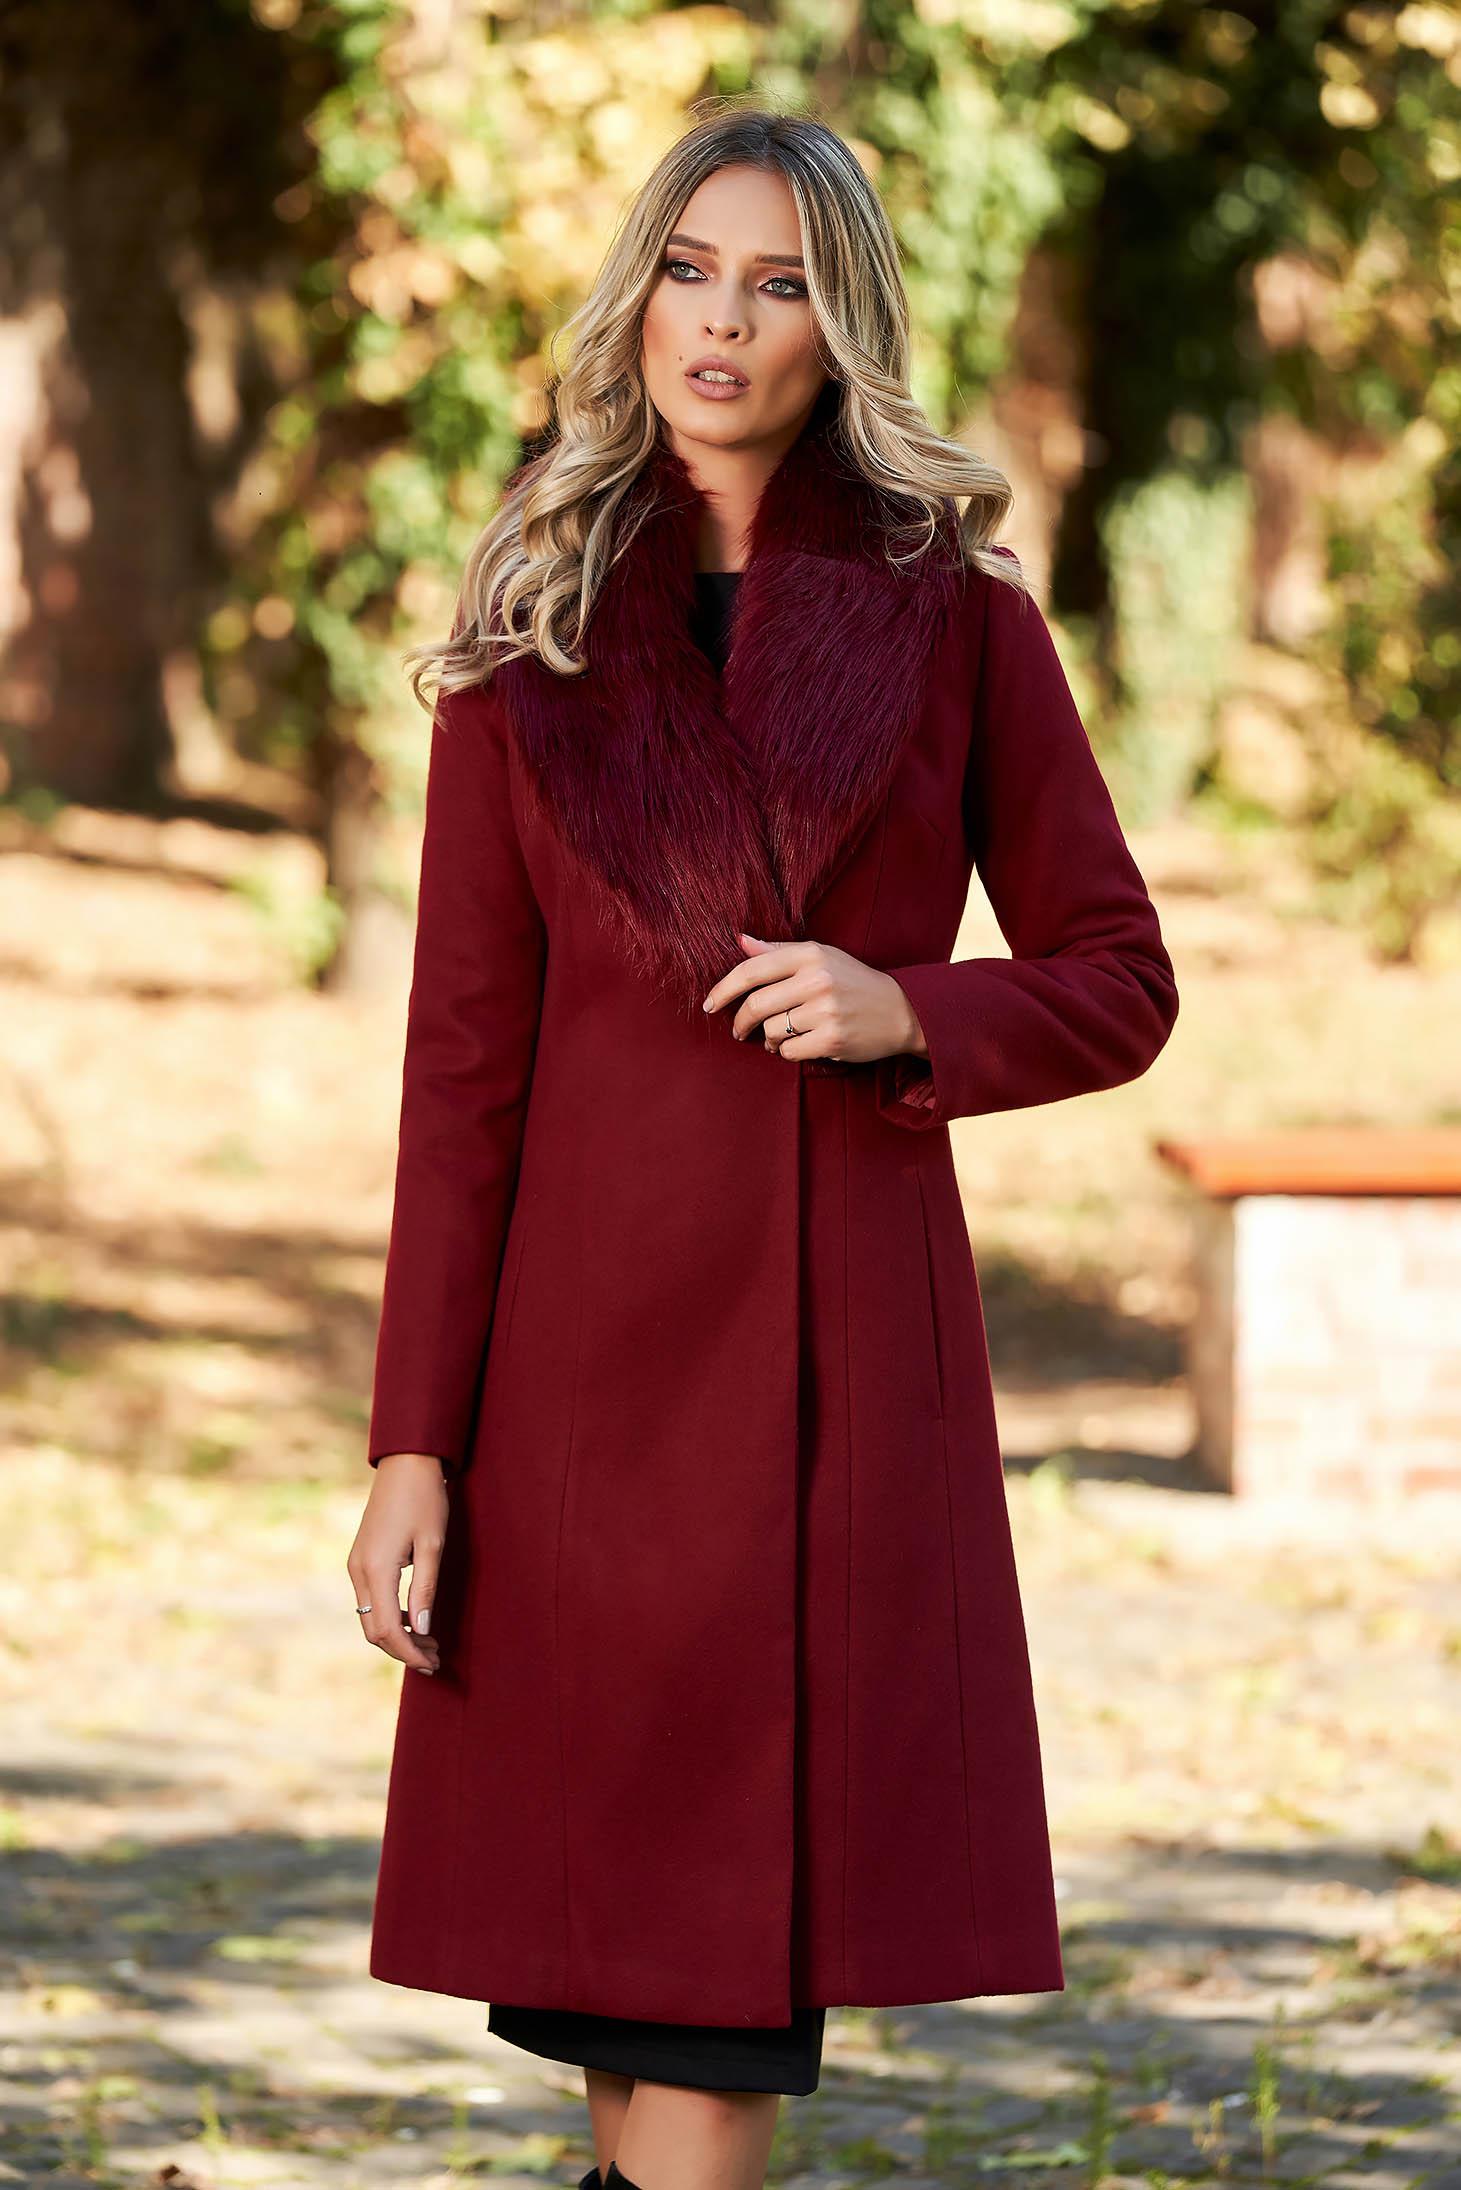 LaDonna burgundy elegant coat with inside lining and fur collar